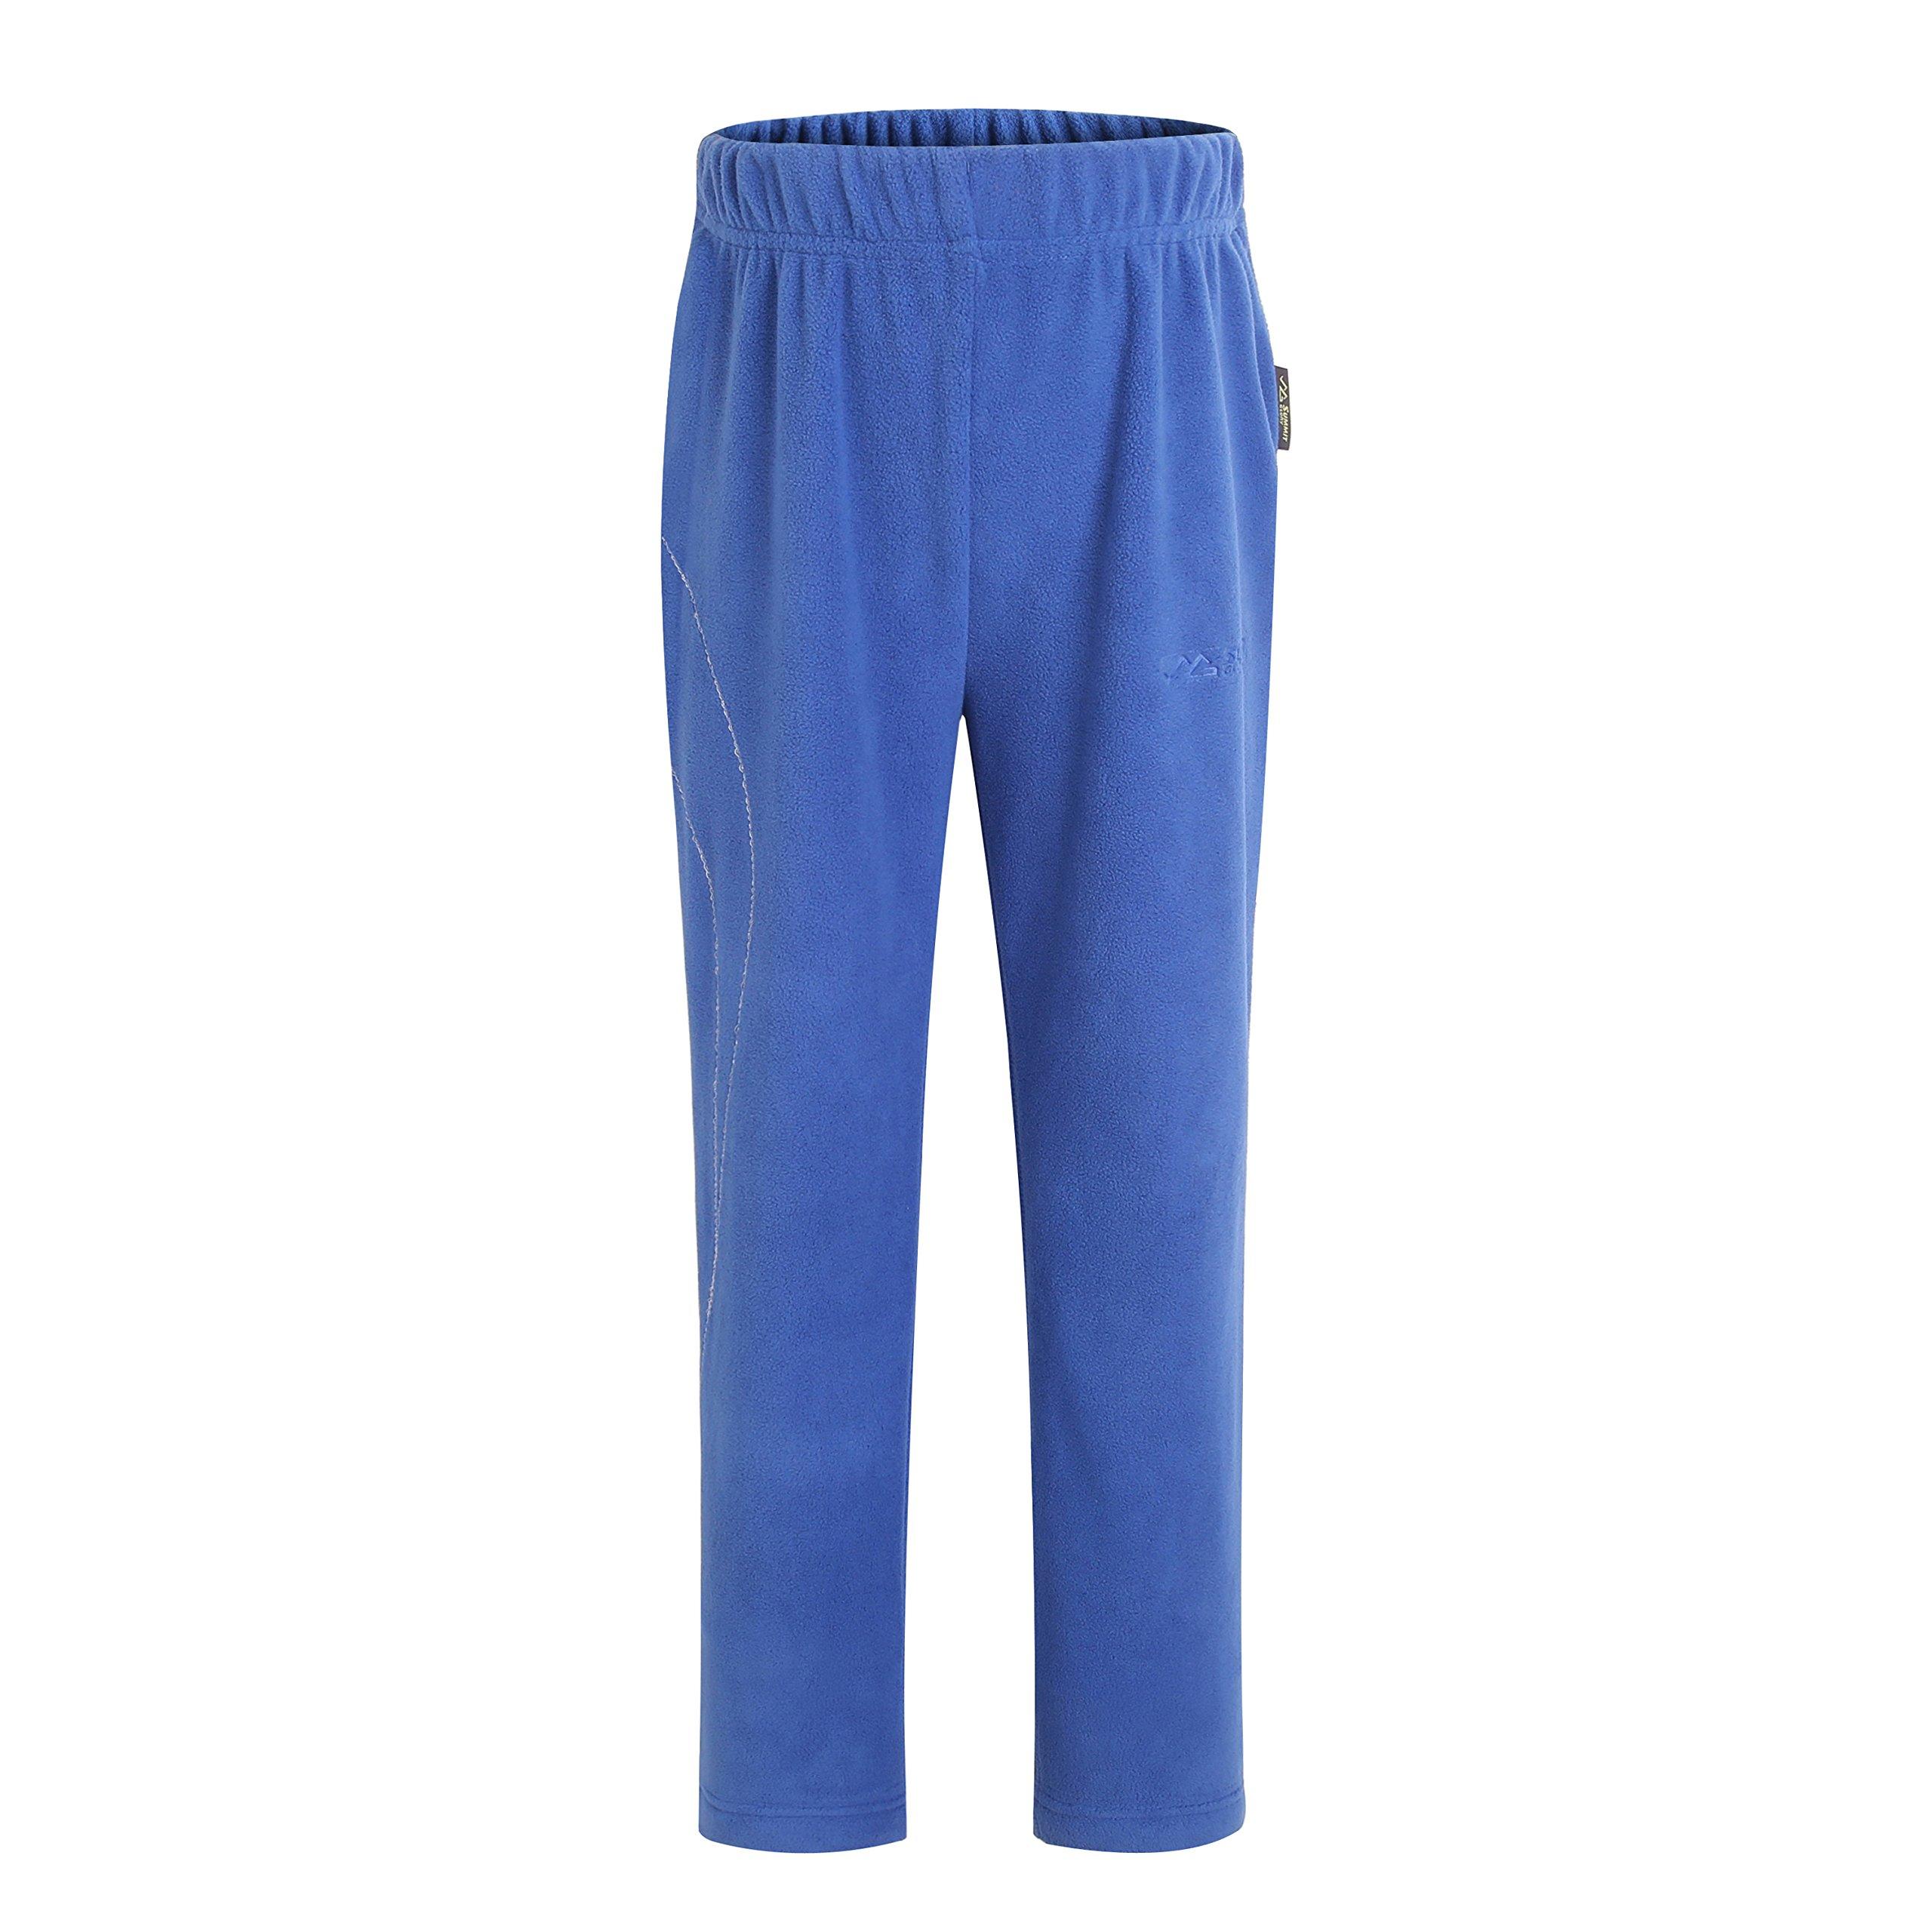 Summit Glory Kid's Microfleece Pants Blue 7-9 T